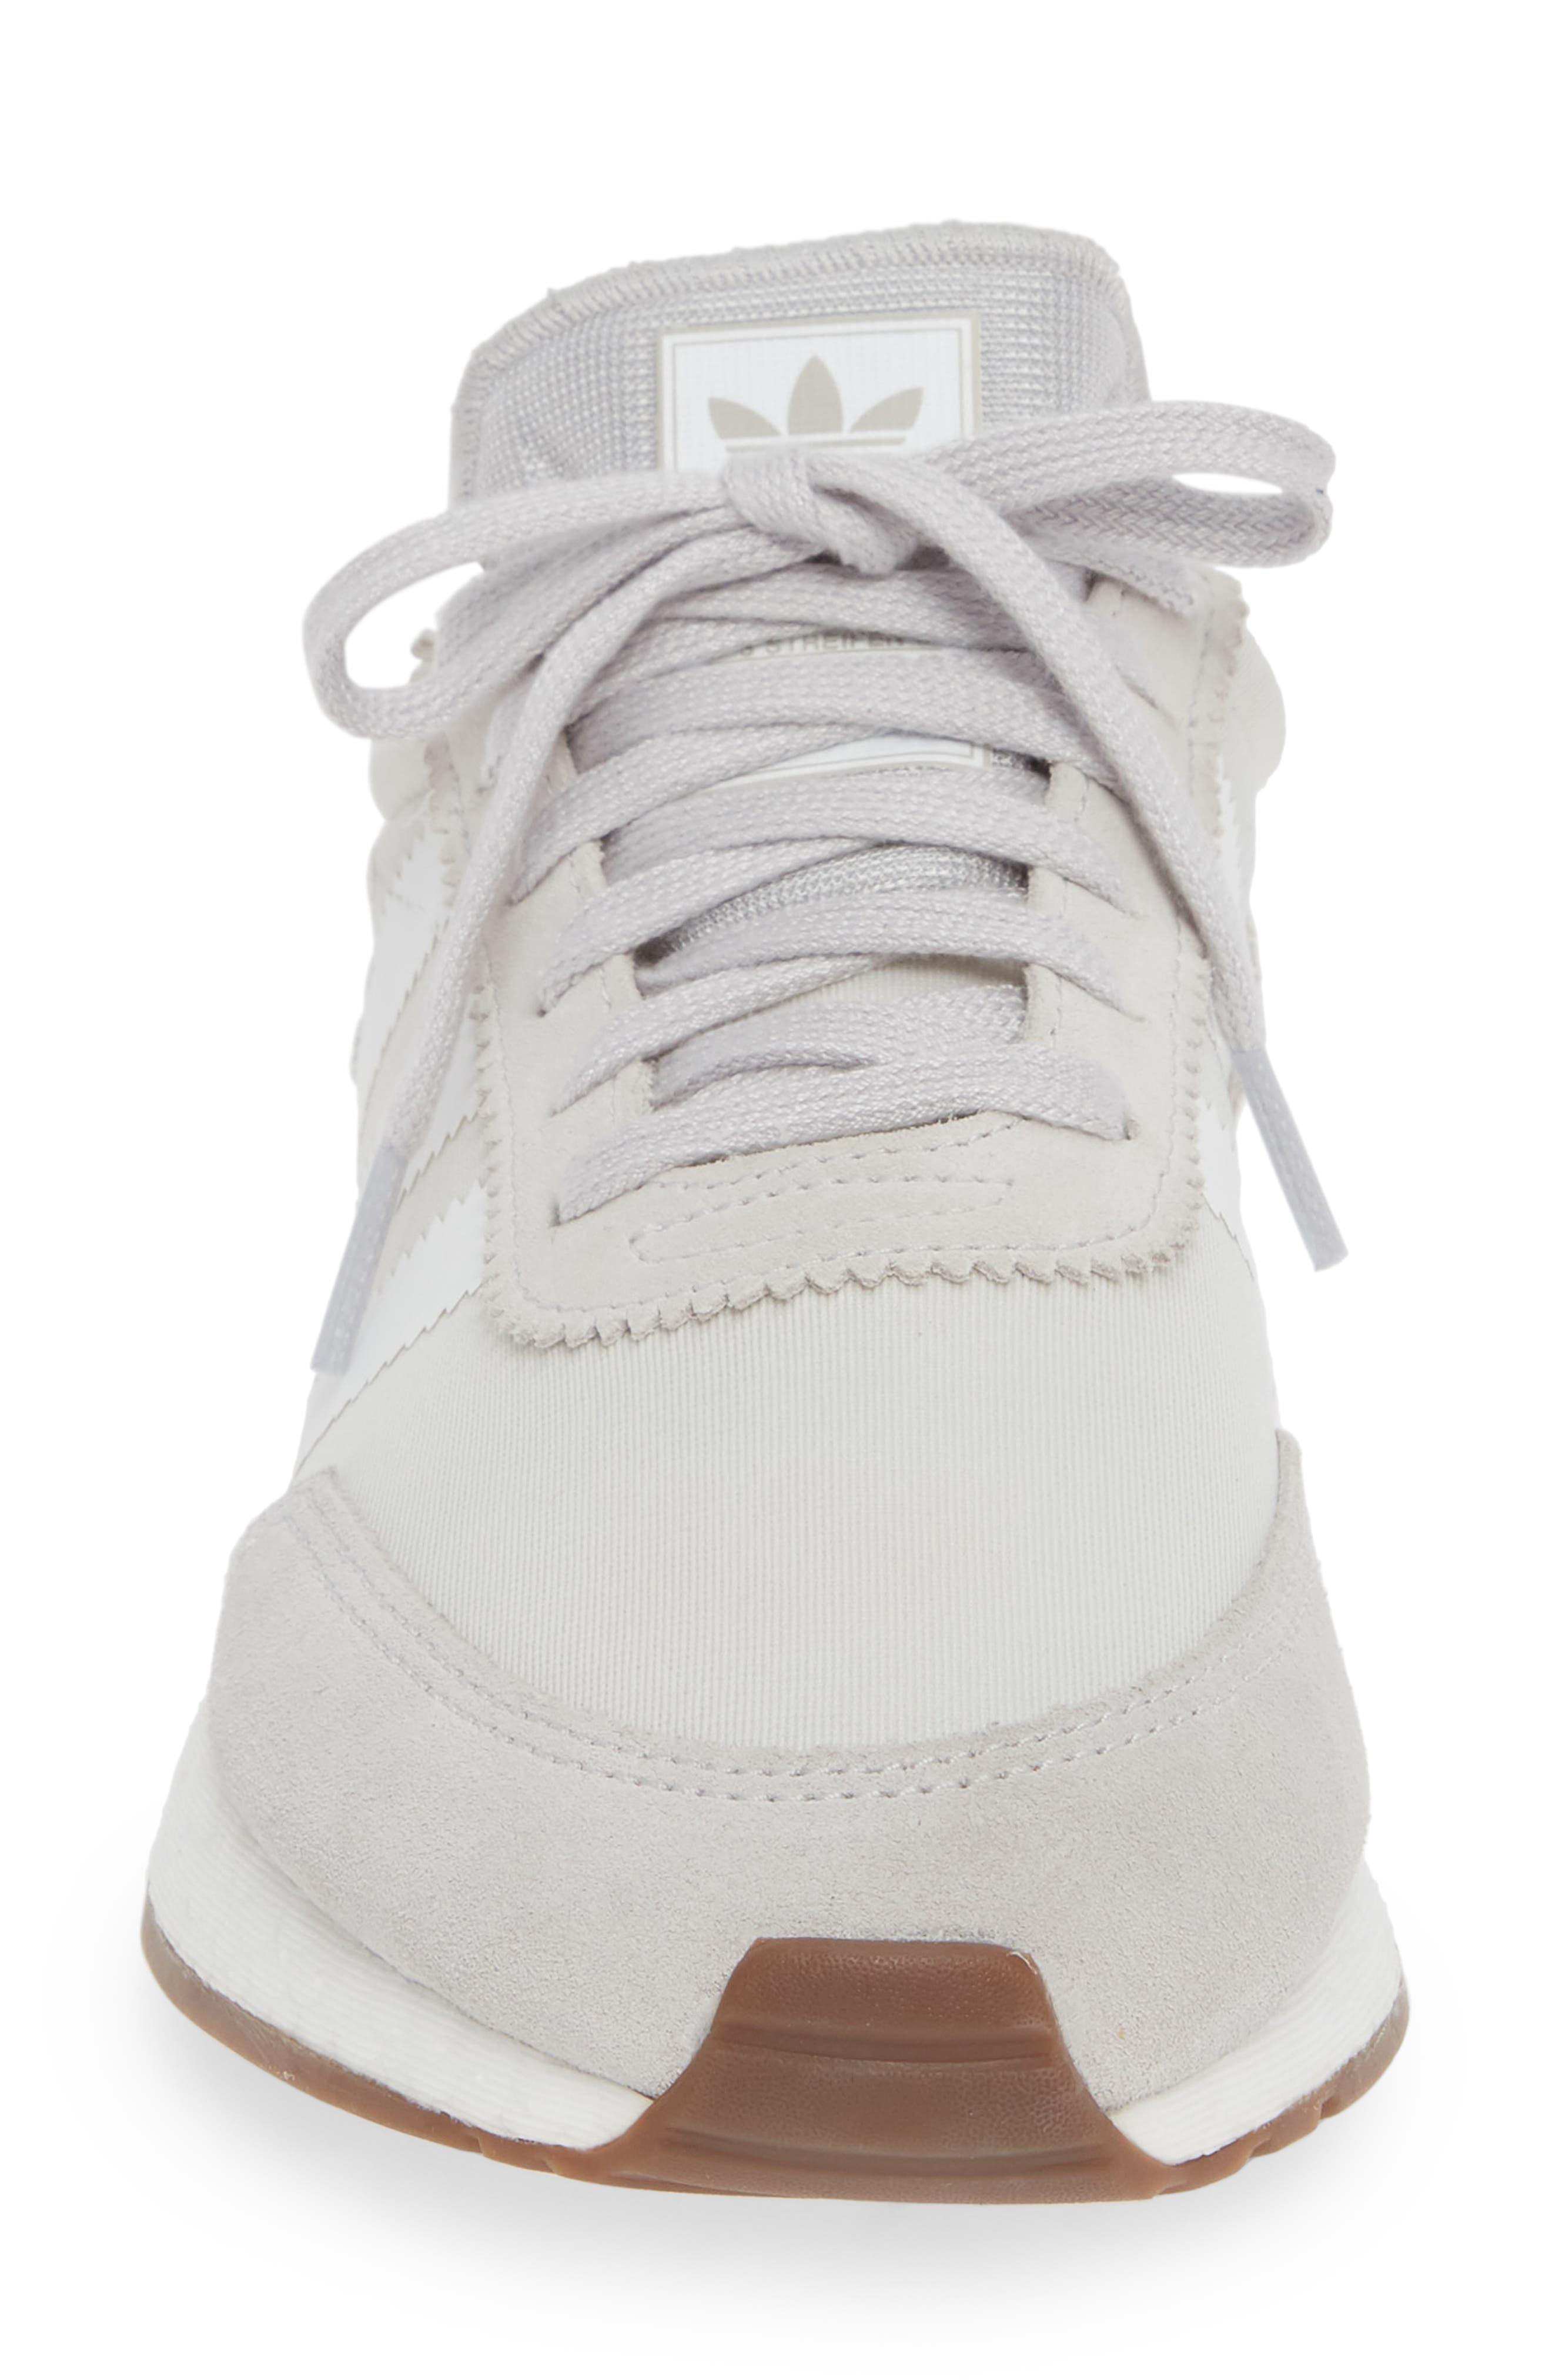 I-5923 Sneaker,                             Alternate thumbnail 4, color,                             GREY ONE/ WHITE/ GREY FIVE